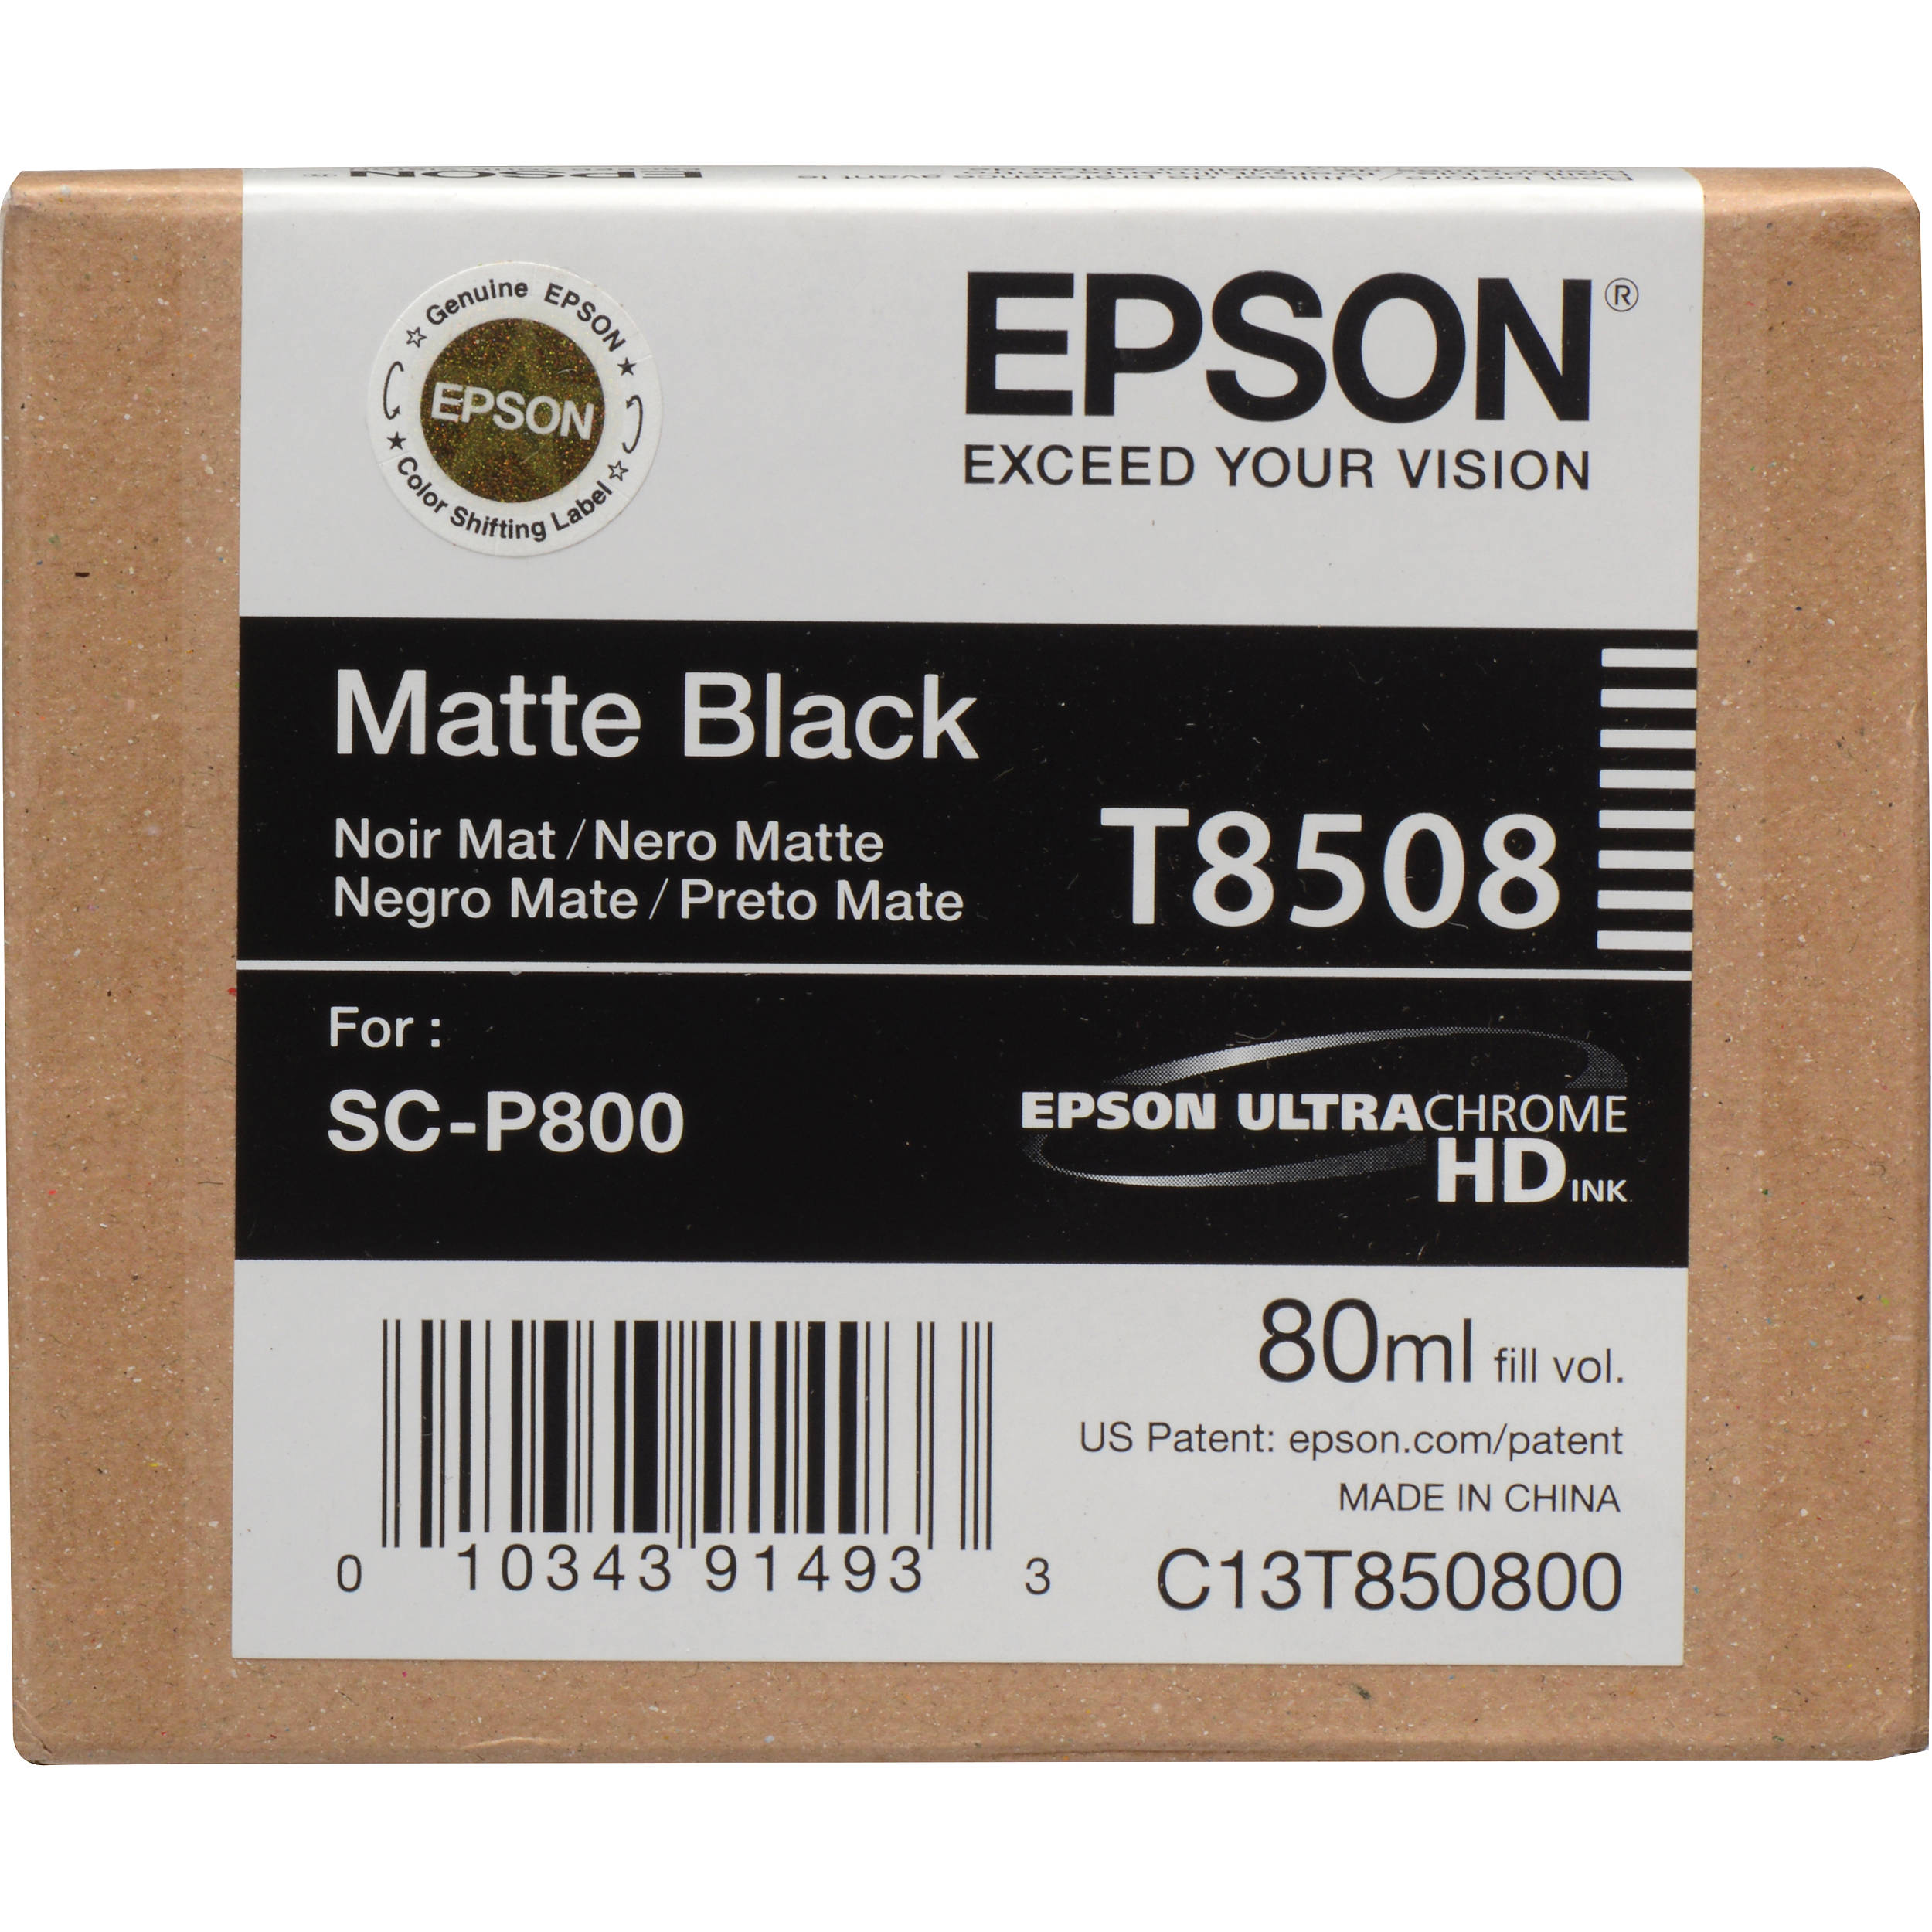 Epson T850800 Ink Cartridge - Matte Black